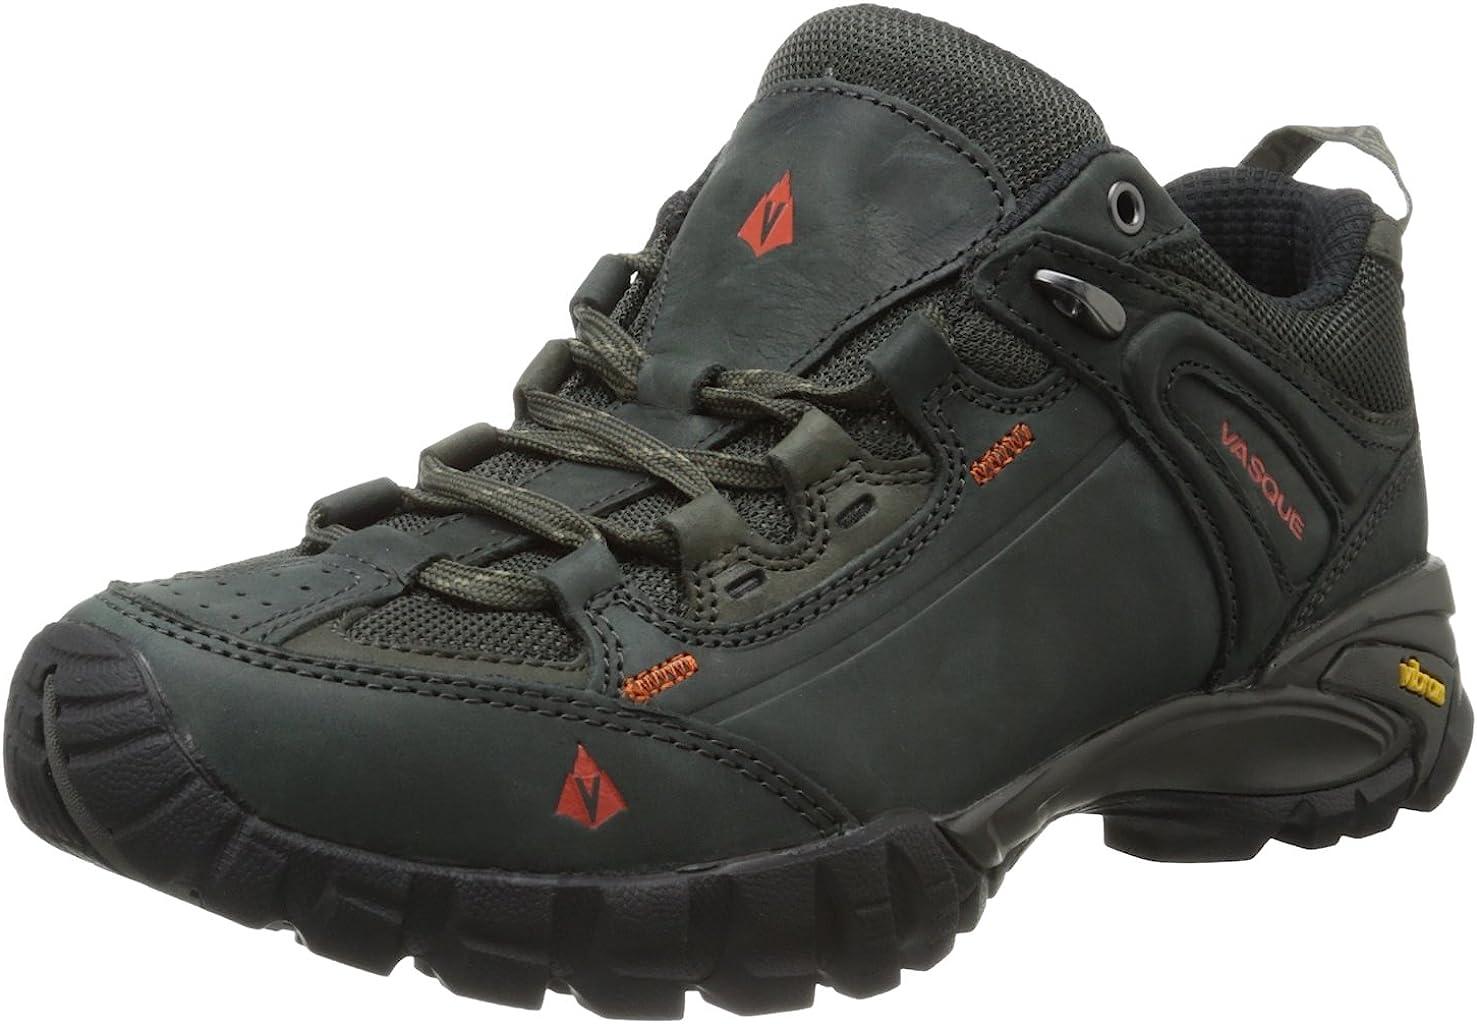 Vasque Womens Mantra 2.0 Gore-Tex Hiking Shoe